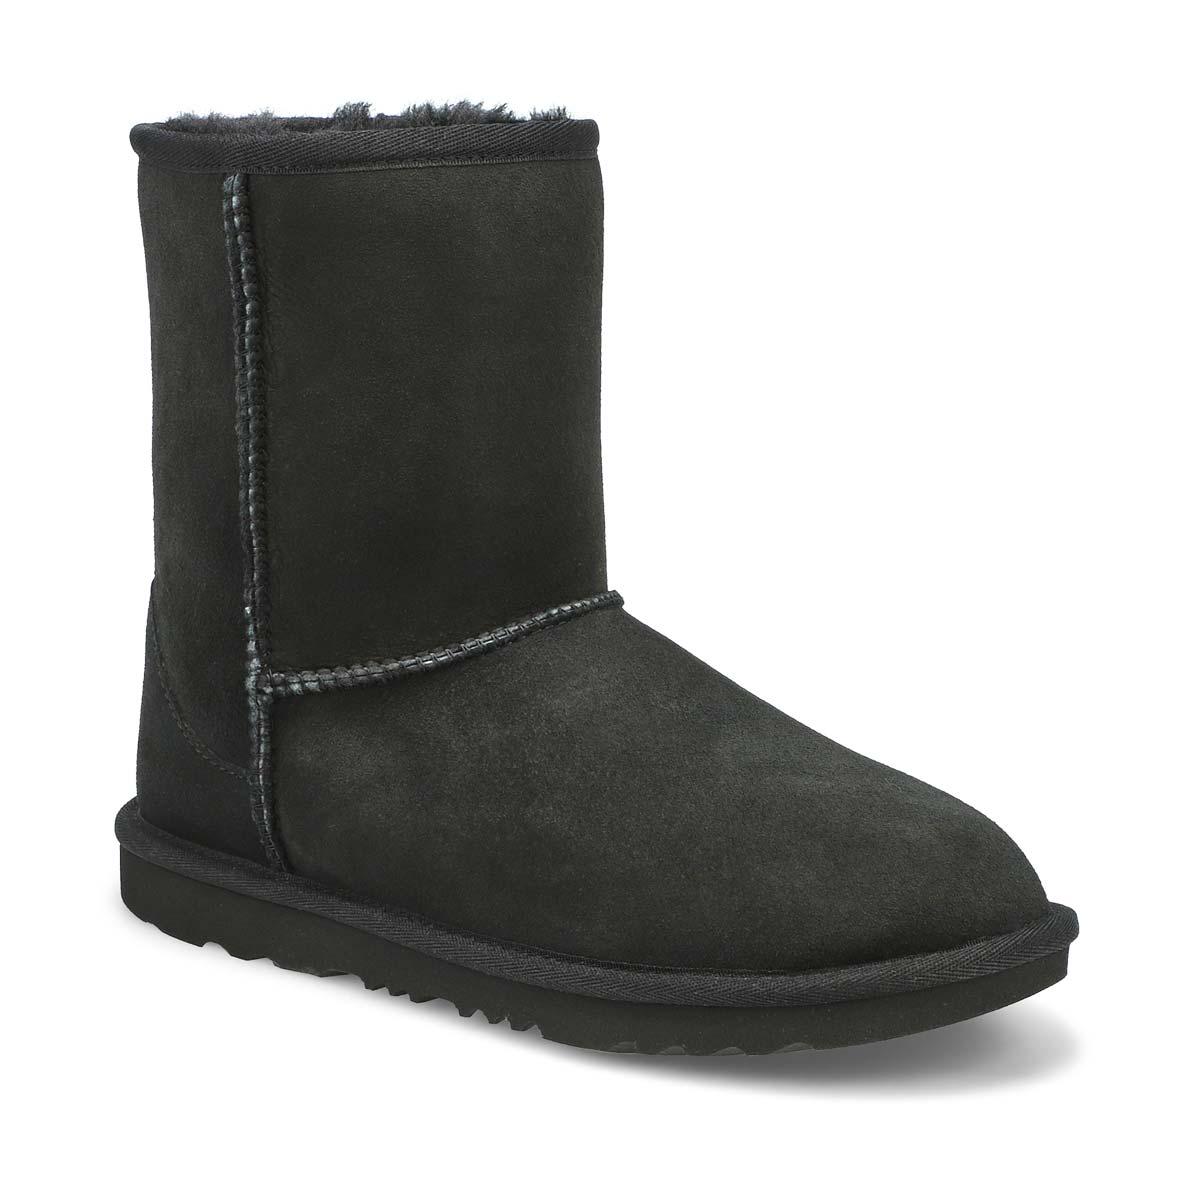 Grls Classic II black sheepskin boot